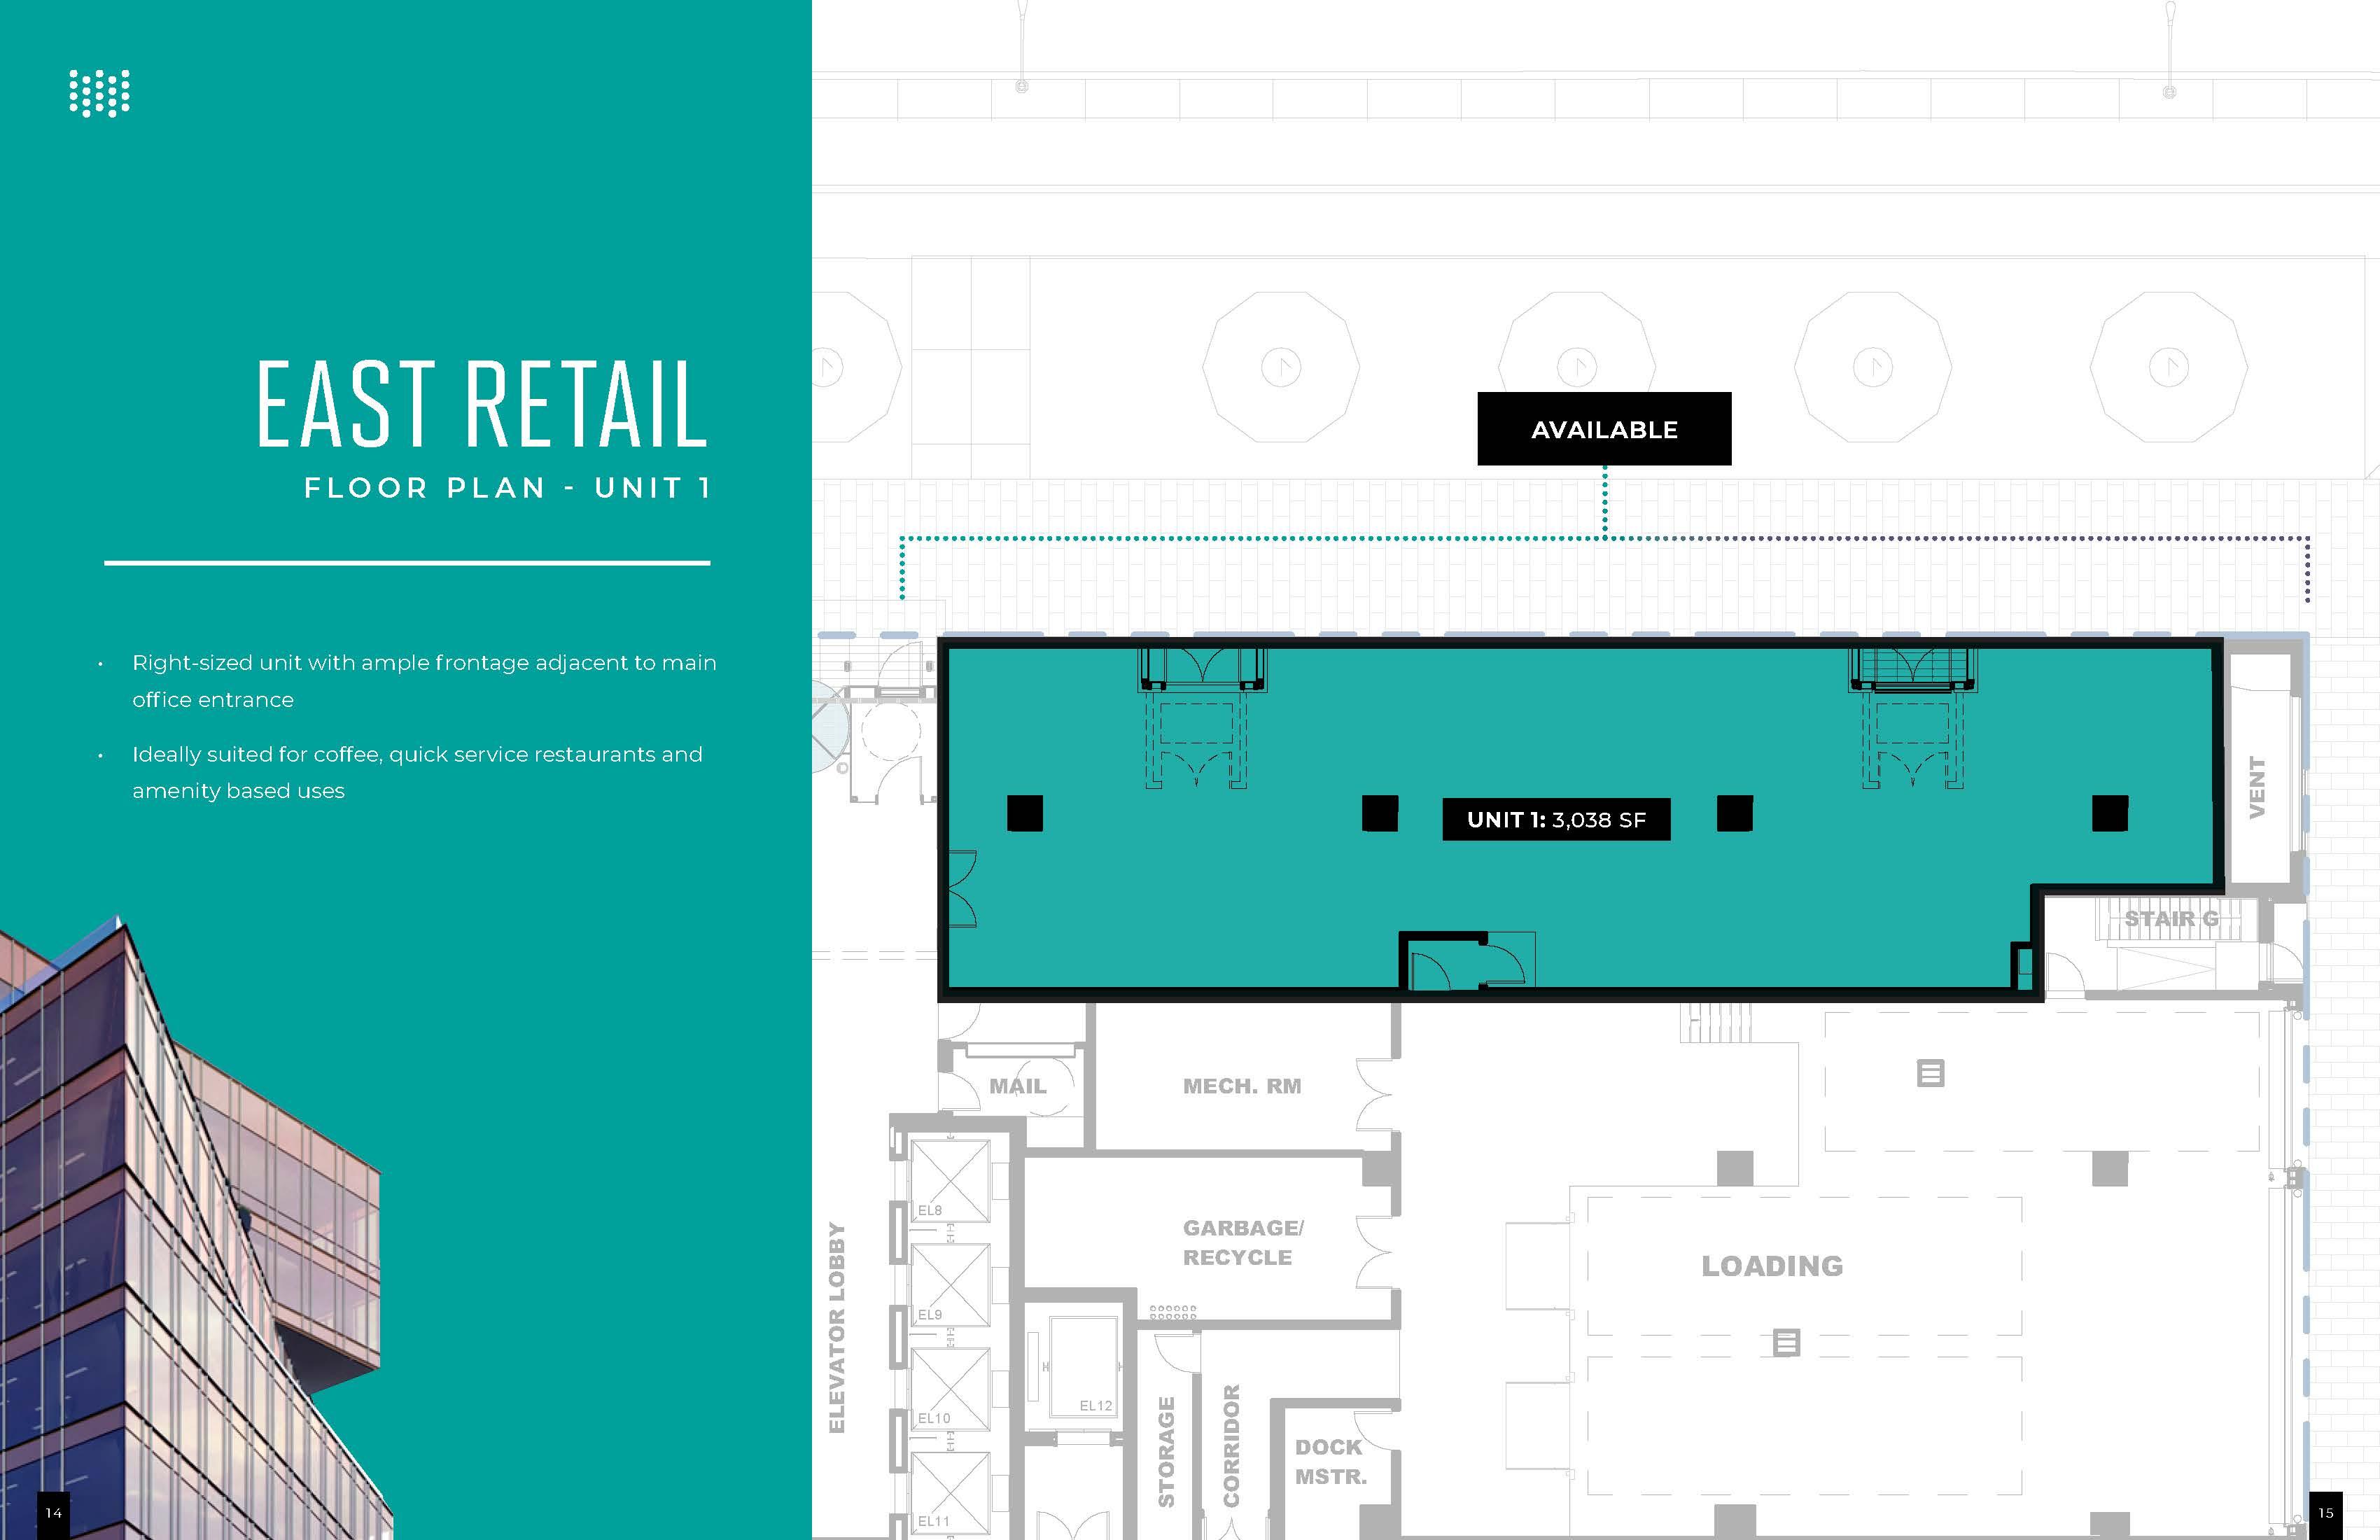 Floorplan thumbnail of East Retail Unit 1